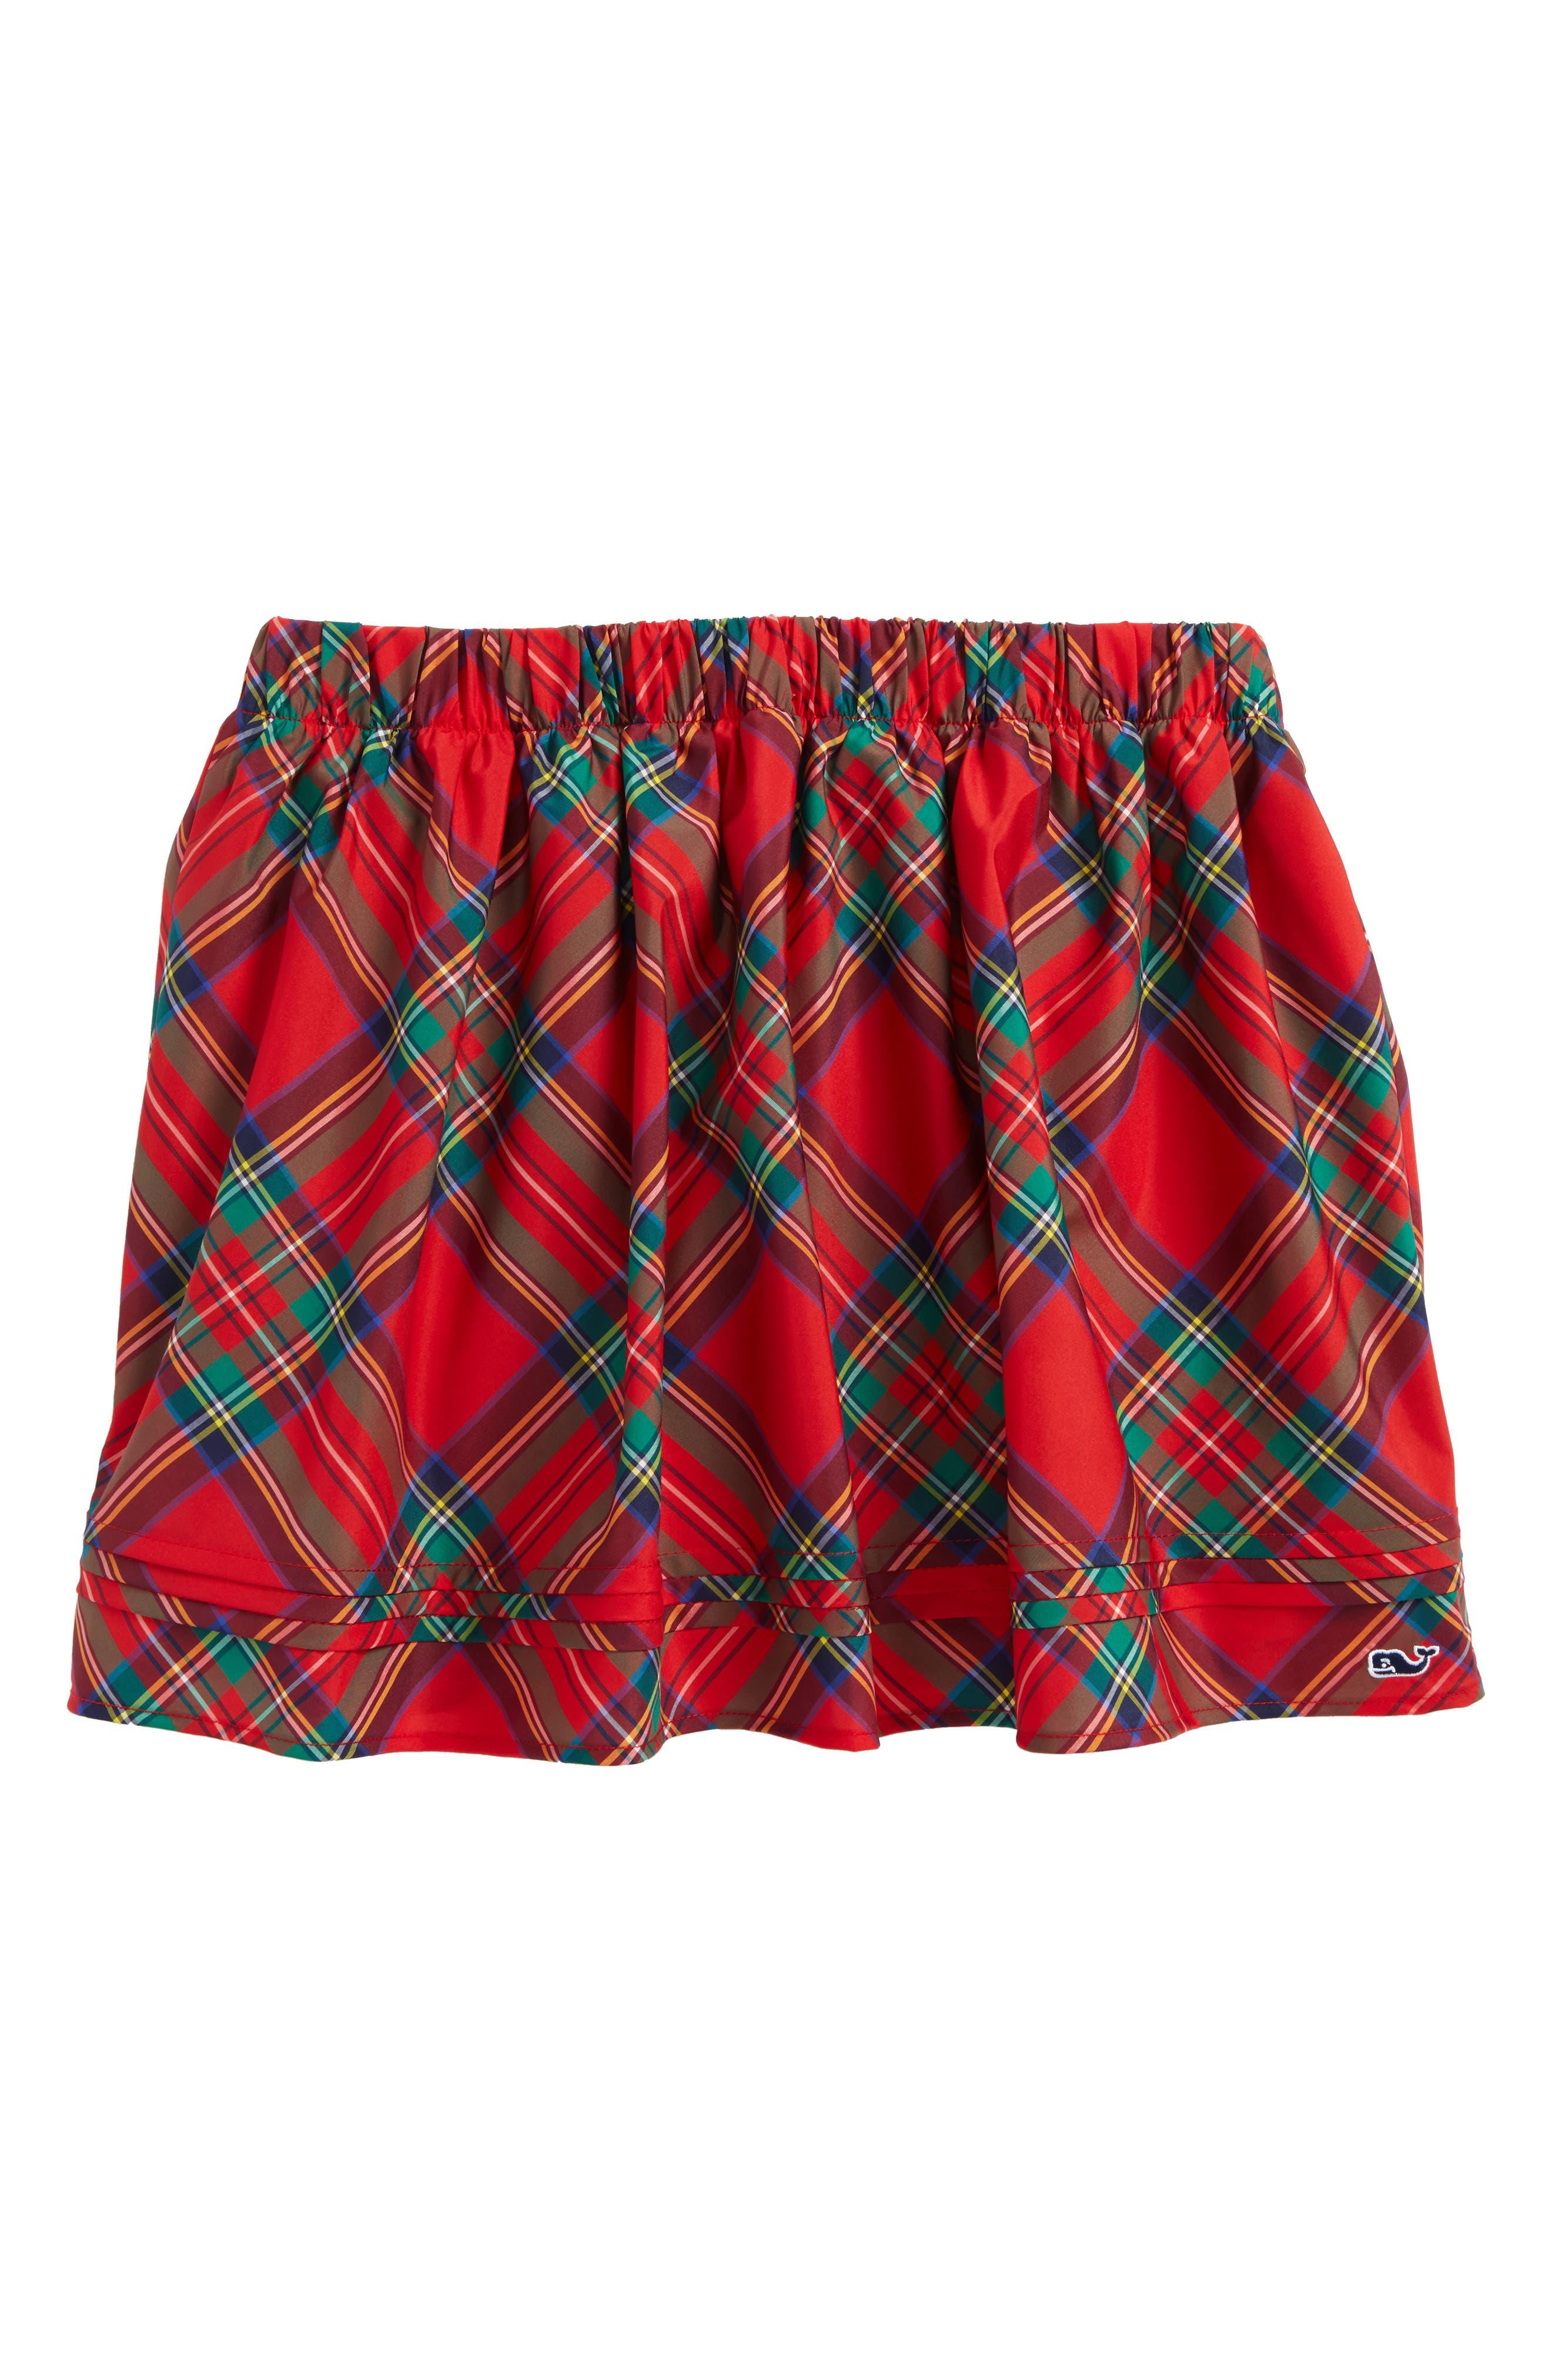 Jolly Plaid Party Skirt,                             Main thumbnail 1, color,                             634